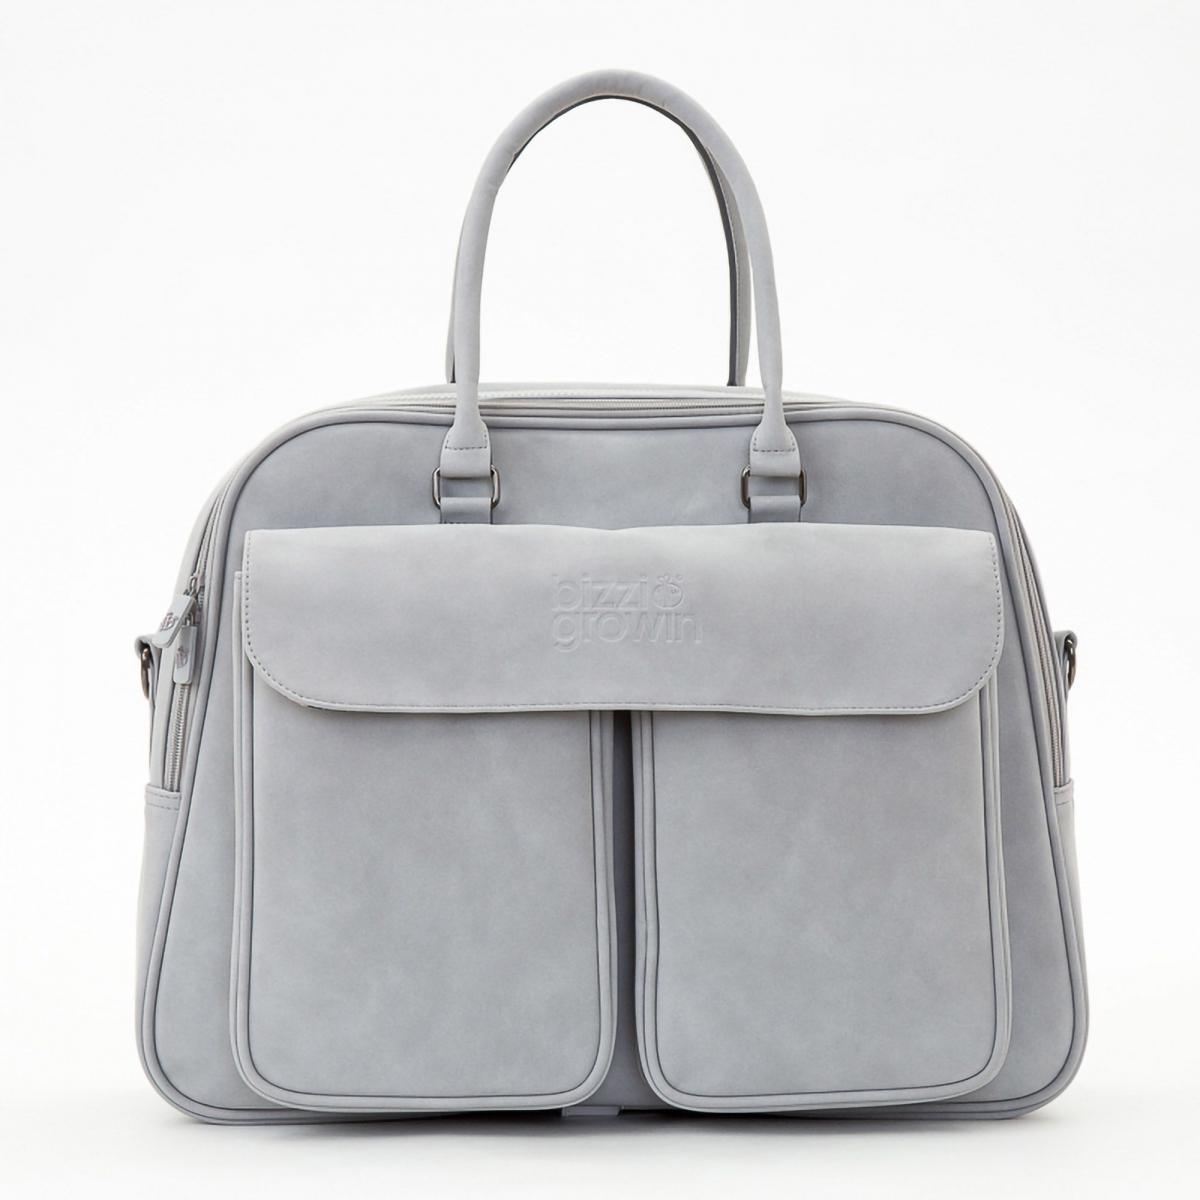 Bizzi Growin Vegan Leather Pod Bag-Whisper Grey (NEW)